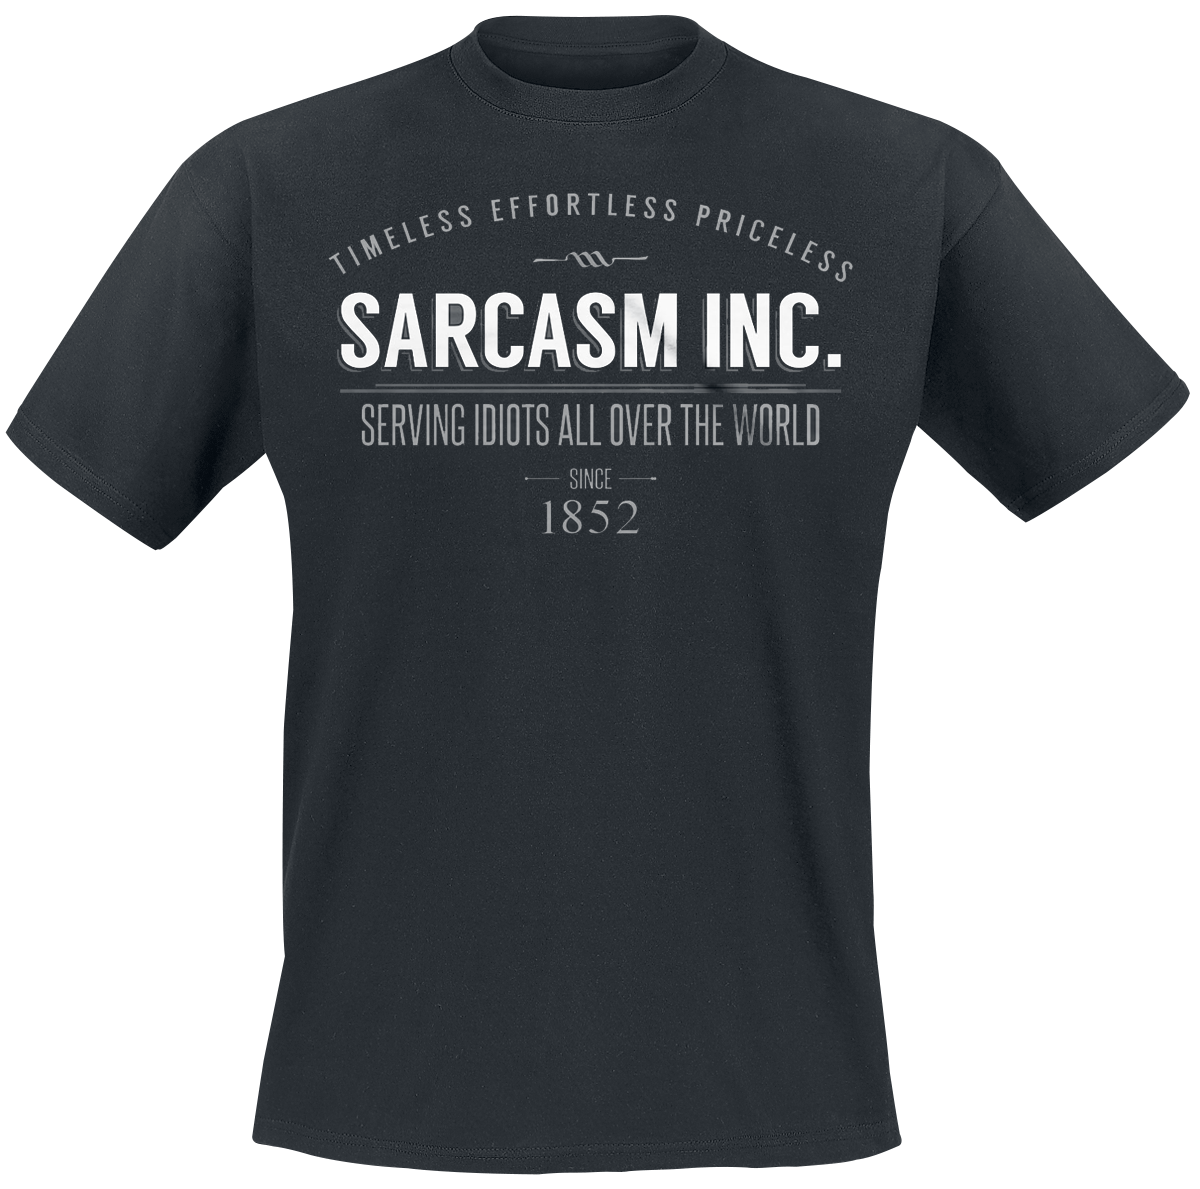 Sarcasm Inc. -  - T-Shirt - black image